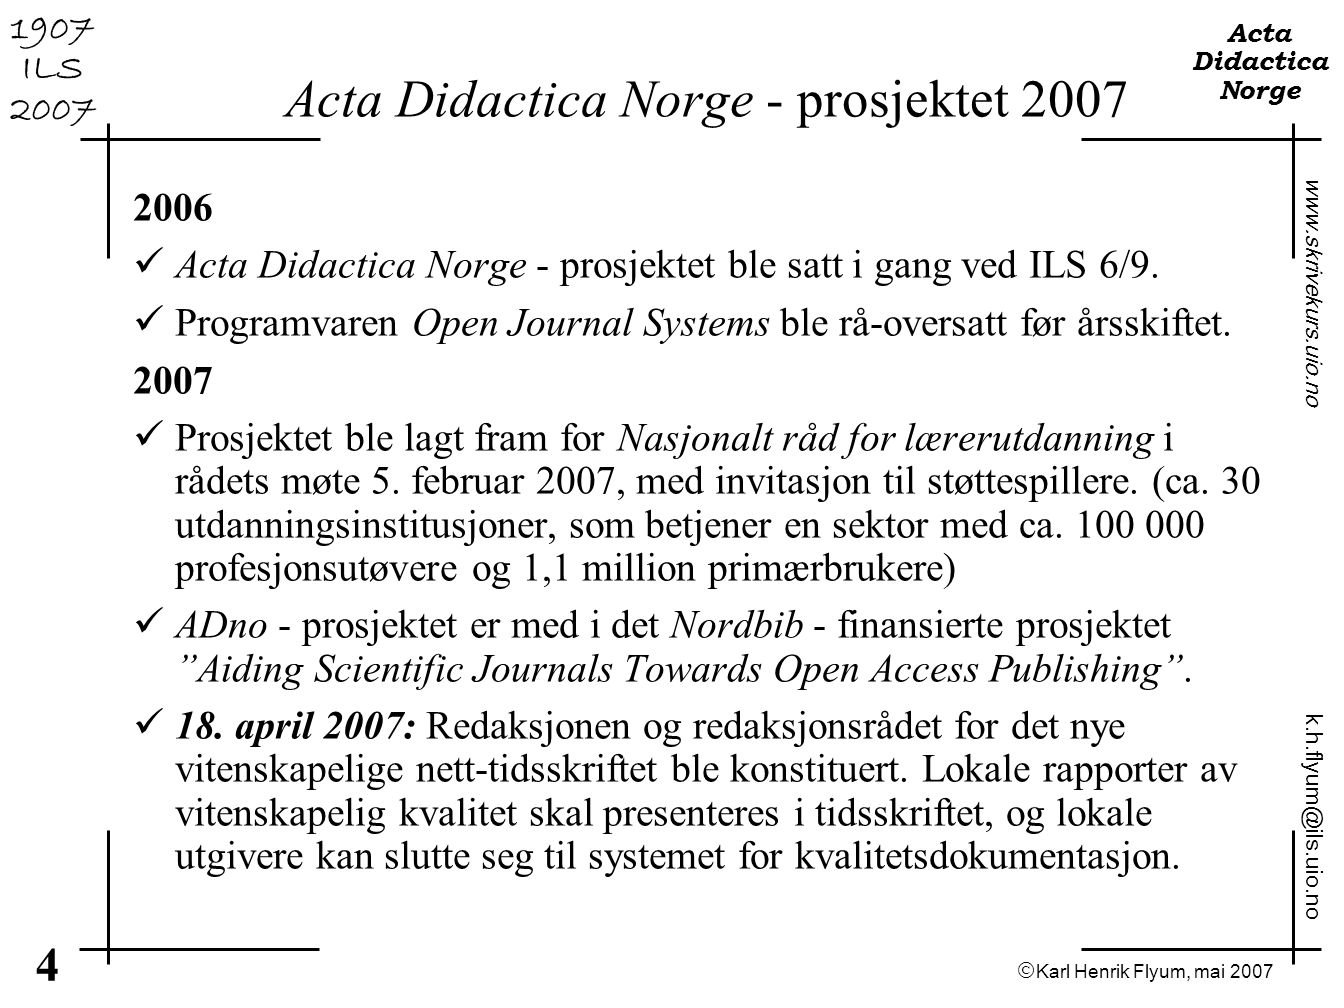  Karl Henrik Flyum, mai 2007 4 www.skrivekurs.uio.no k.h.flyum@ils.uio.no Acta Didactica Norge 1907 ILS 2007 Acta Didactica Norge - prosjektet 2007 2